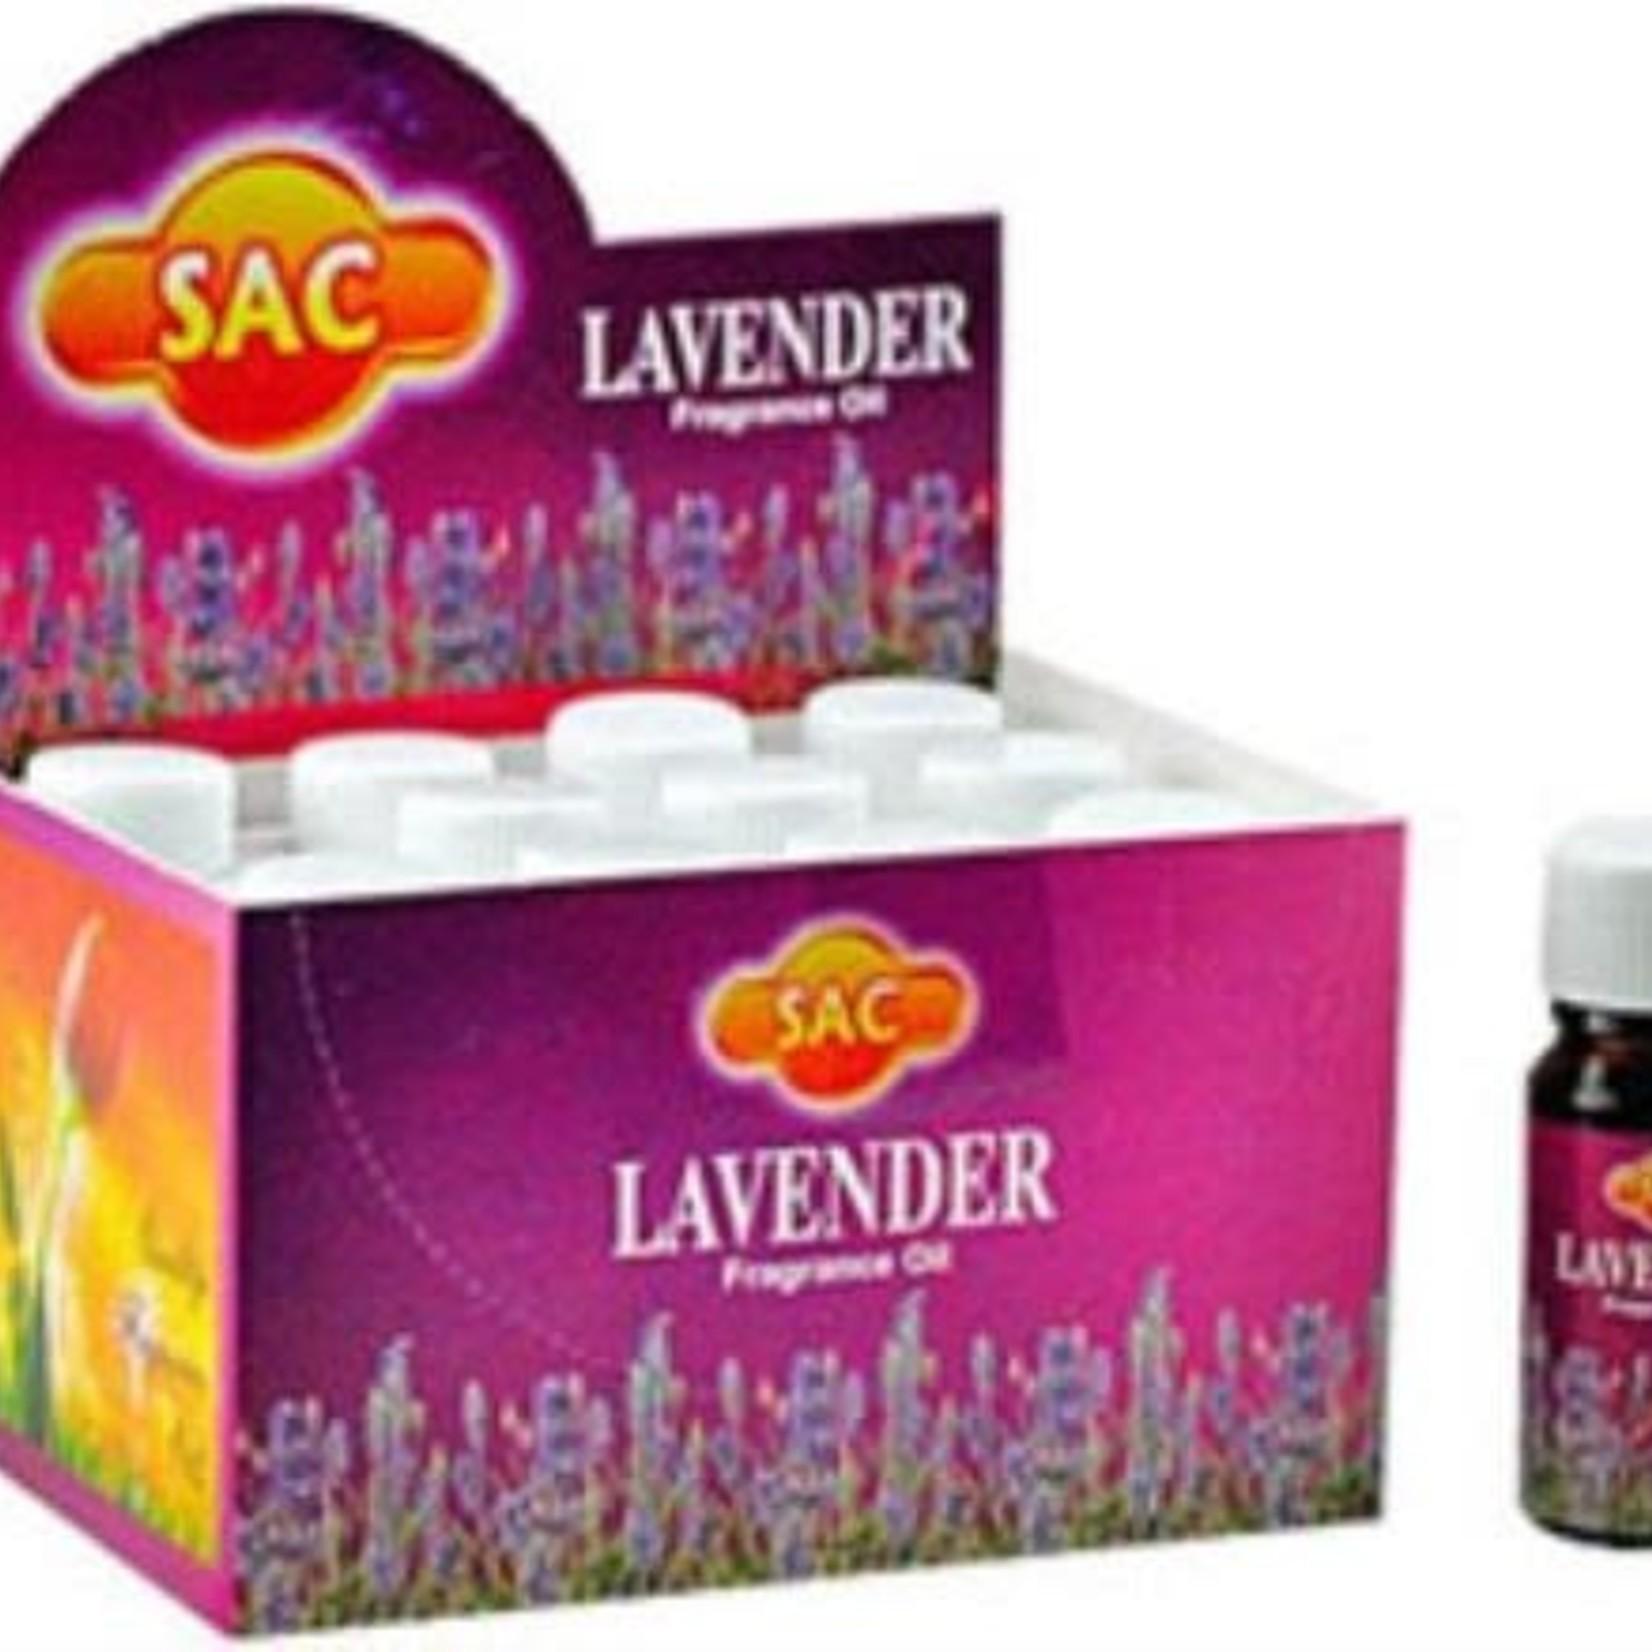 Lavender Fragrance oil - SAC